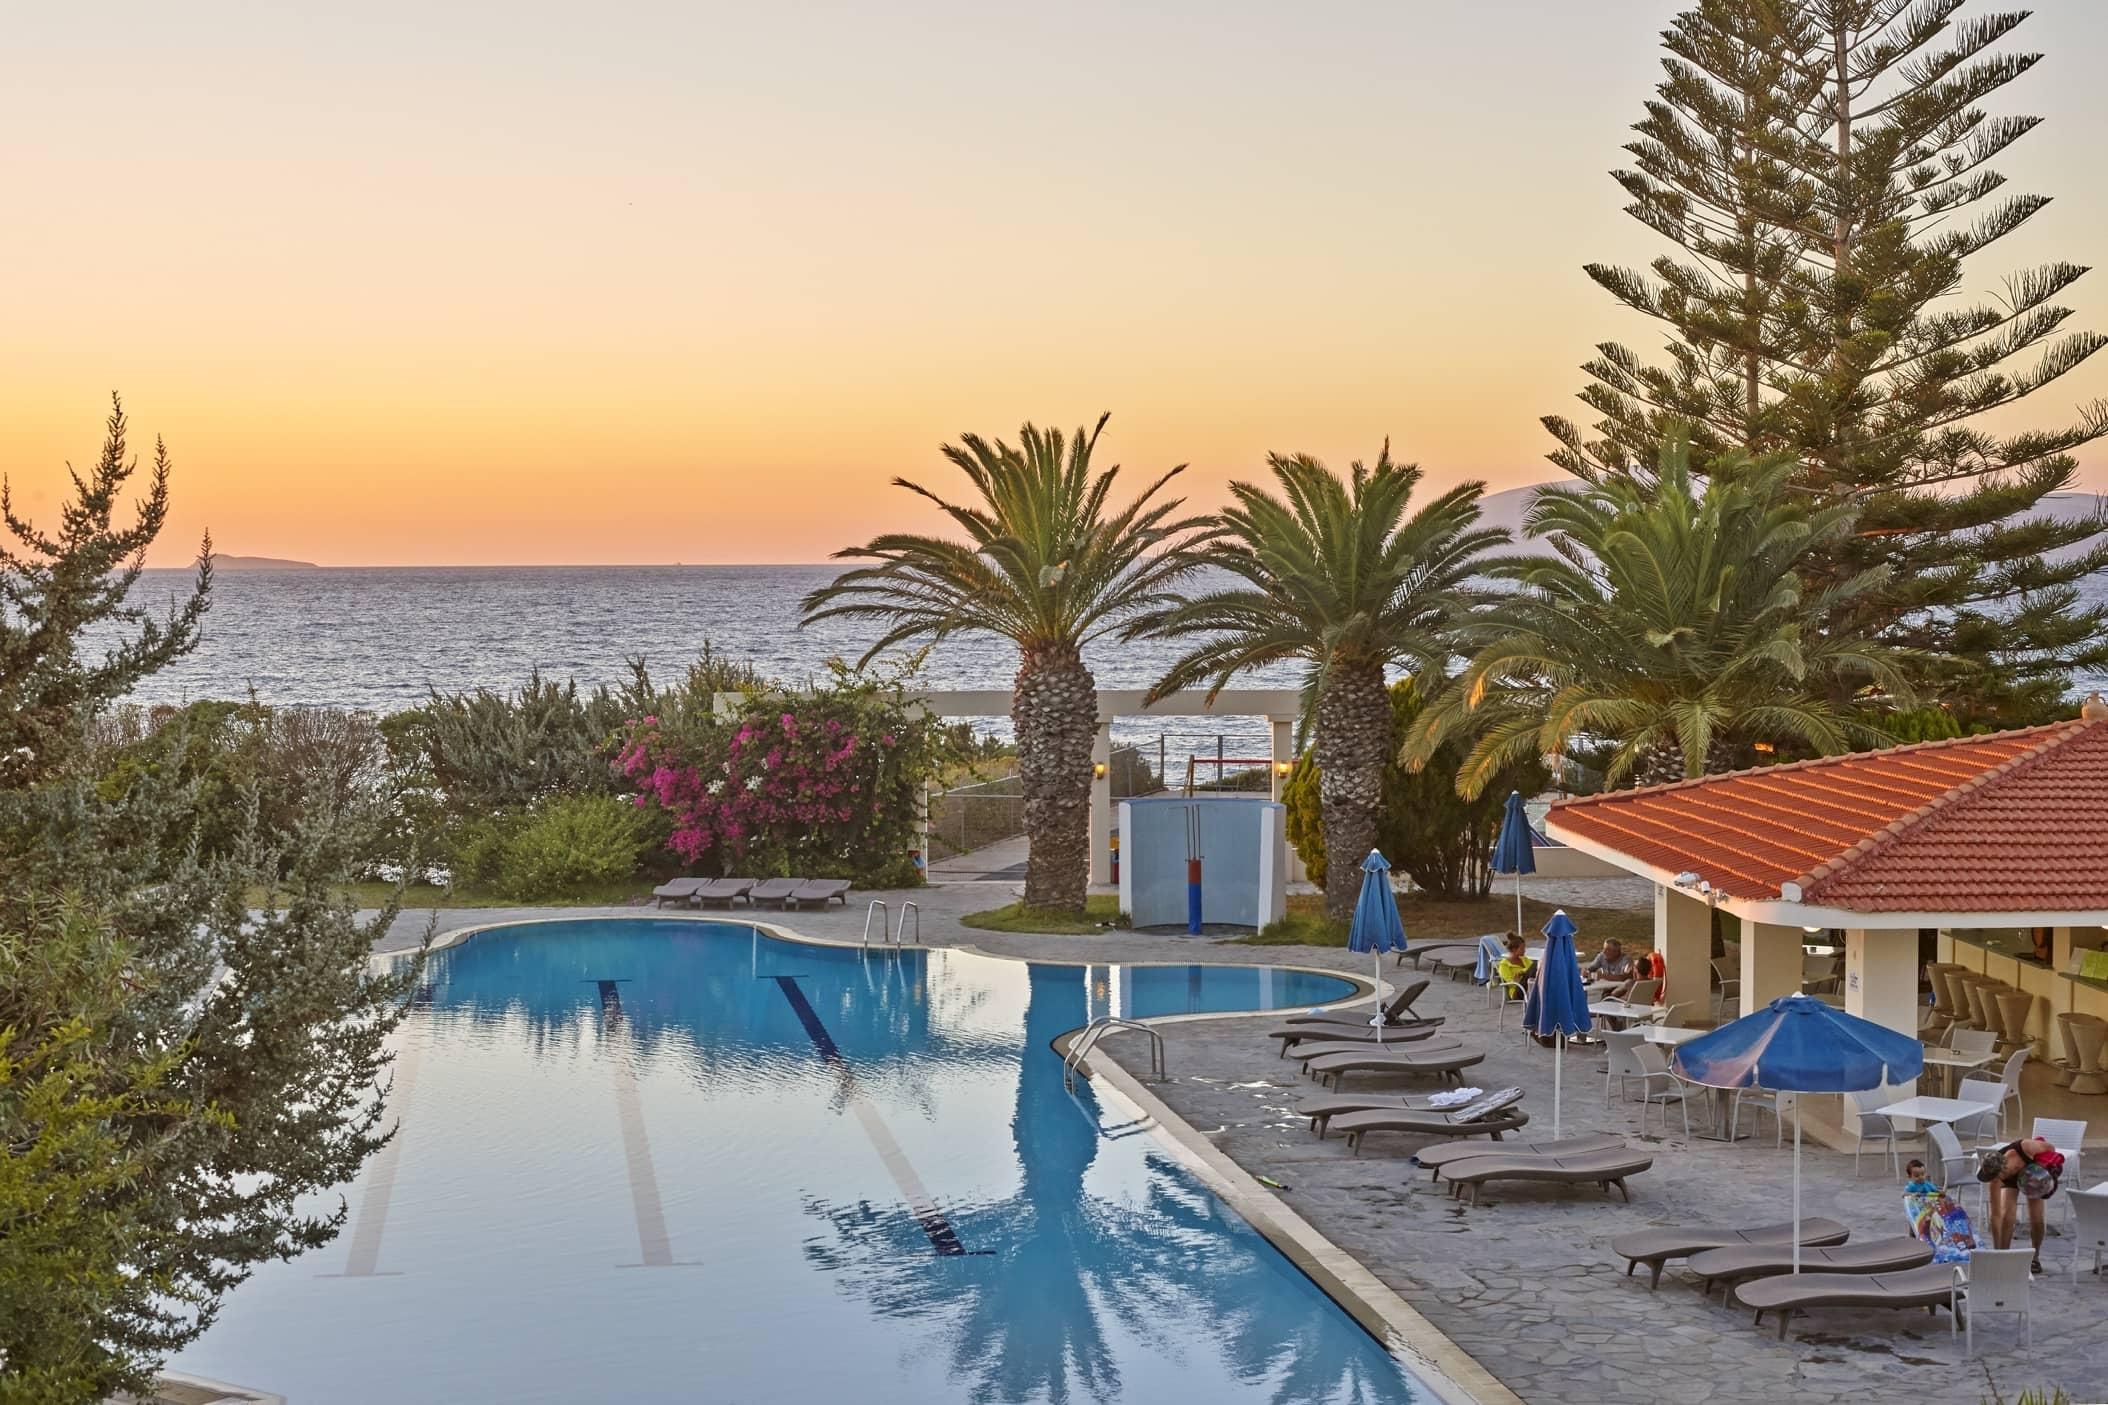 4* Ammos Resort - Μαστιχάρι, Κως ✦ -43% ✦ 4 Ημέρες